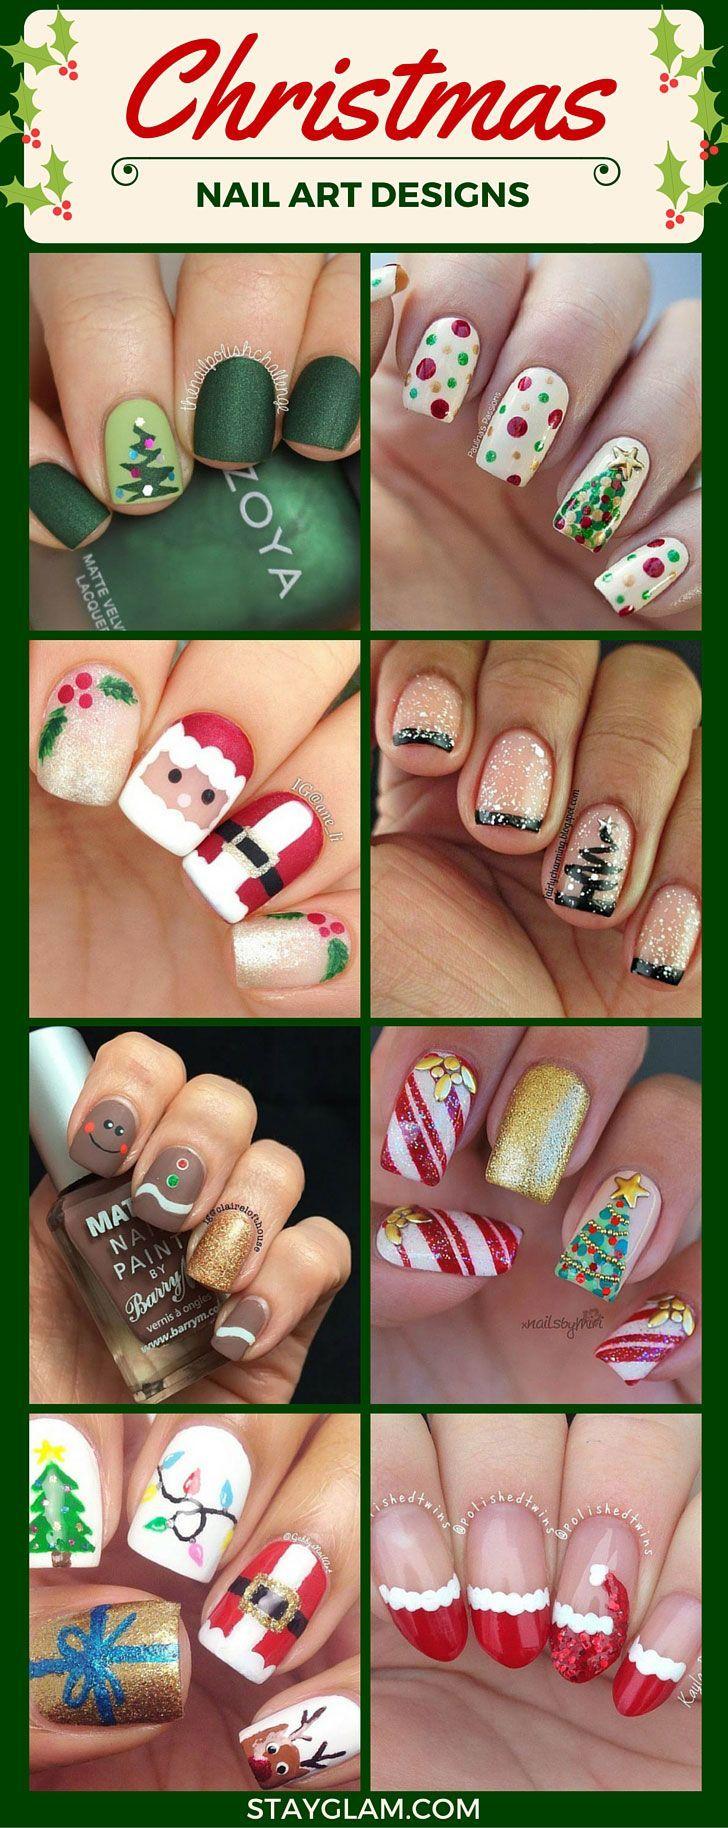 Christmas Nail Art Designs #christmas #nailart #festive - https://www.luxury.guugles.com/christmas-nail-art-designs-christmas-nailart-festive/